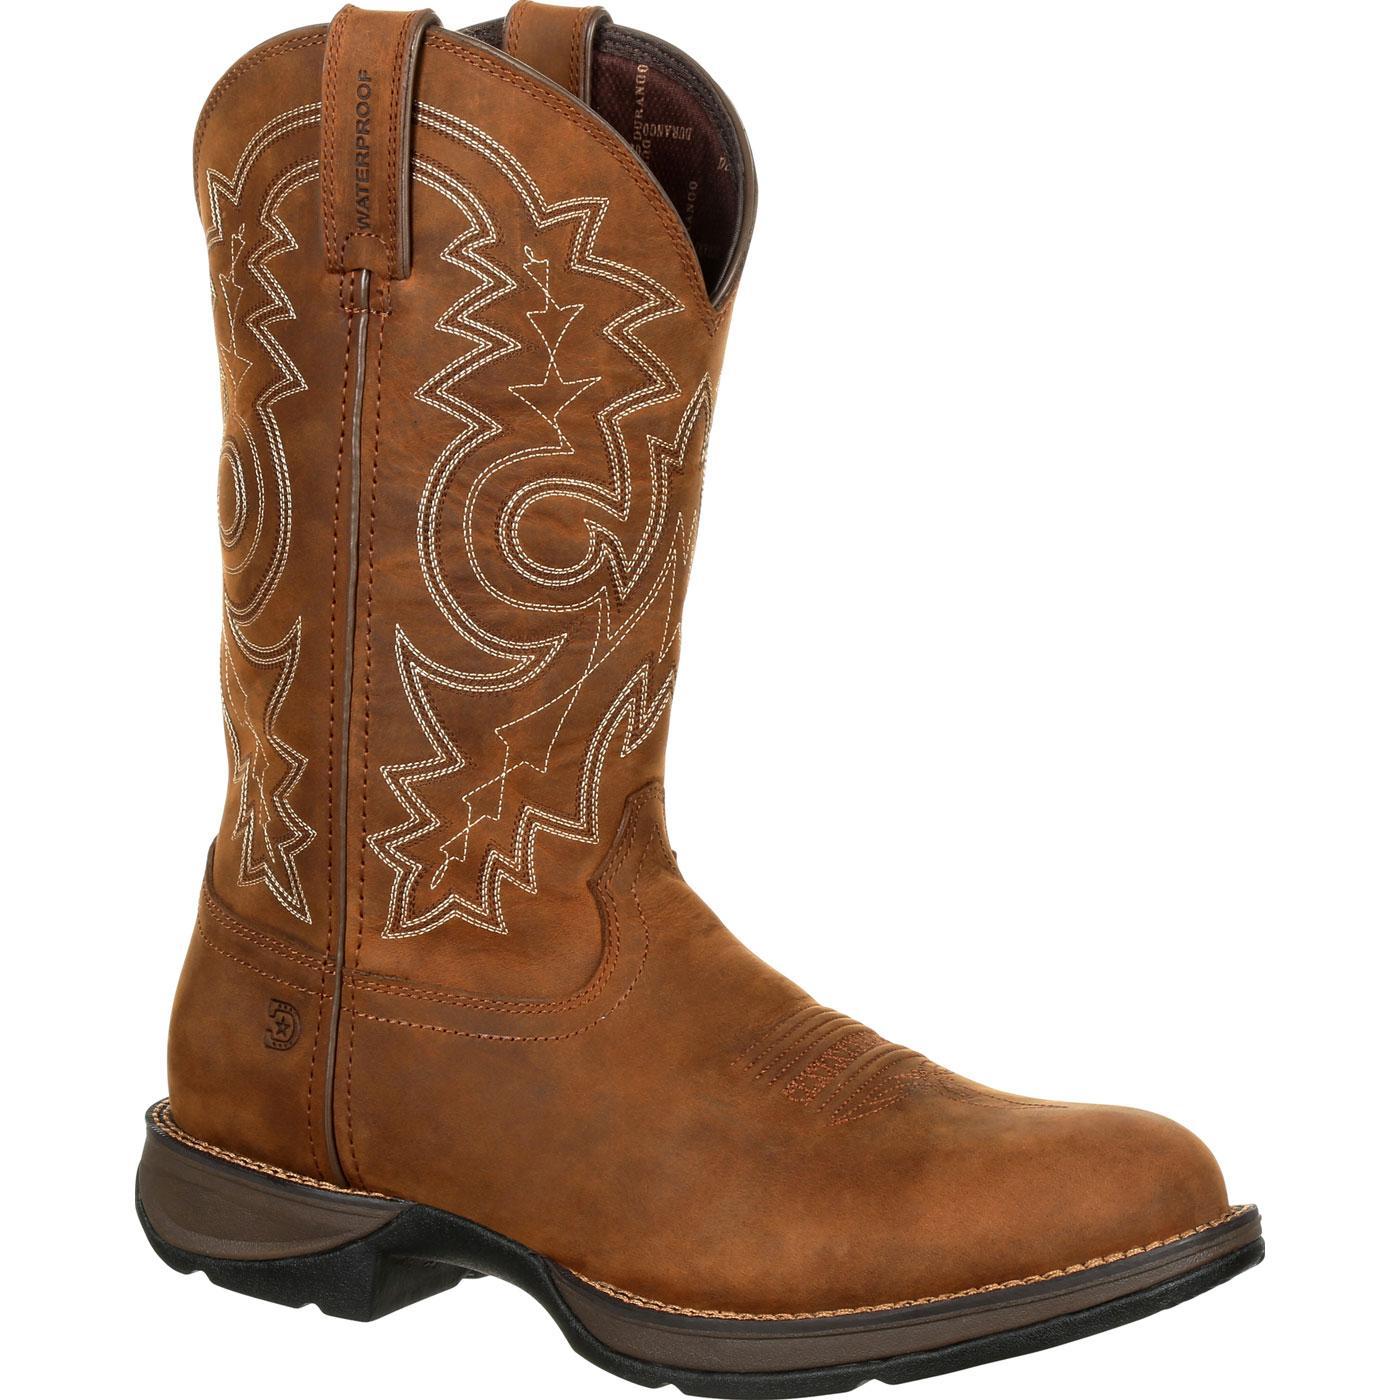 651d8978d35 Rebel by Durango Waterproof Western Boot